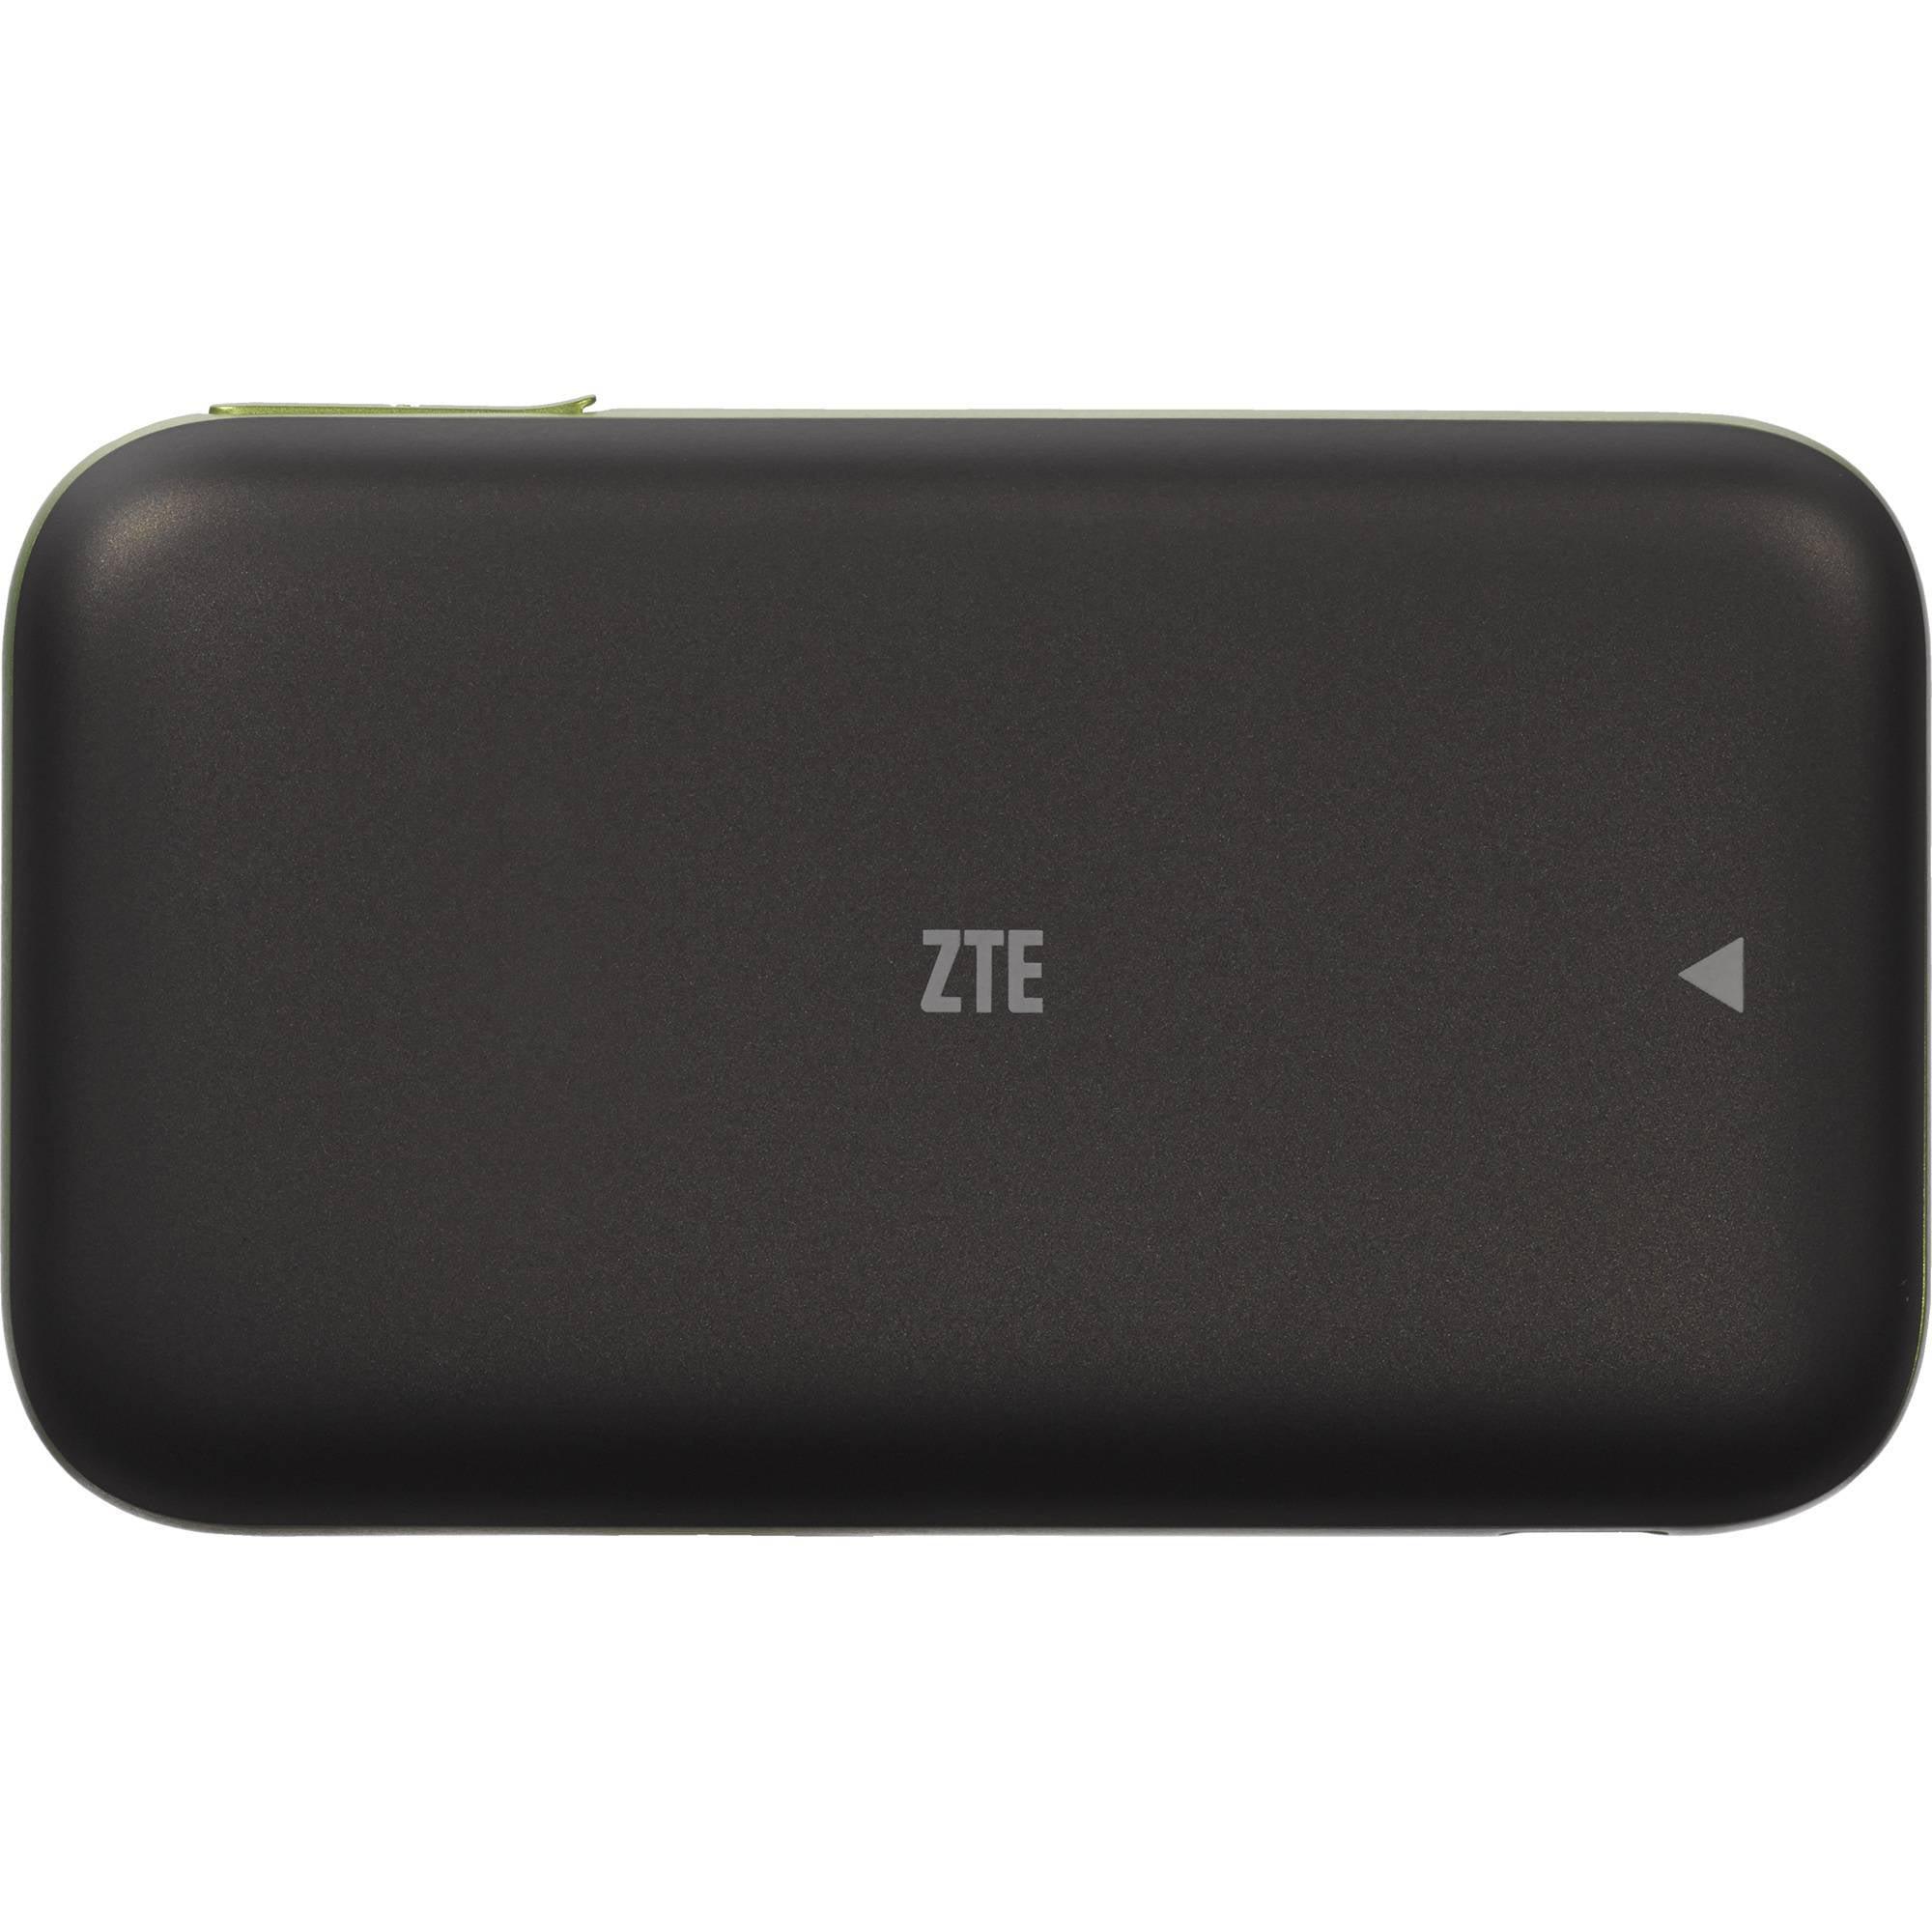 Straight Talk ZTE LTE Mobile Hotspot w/Bonus $15 1GB Data Plan